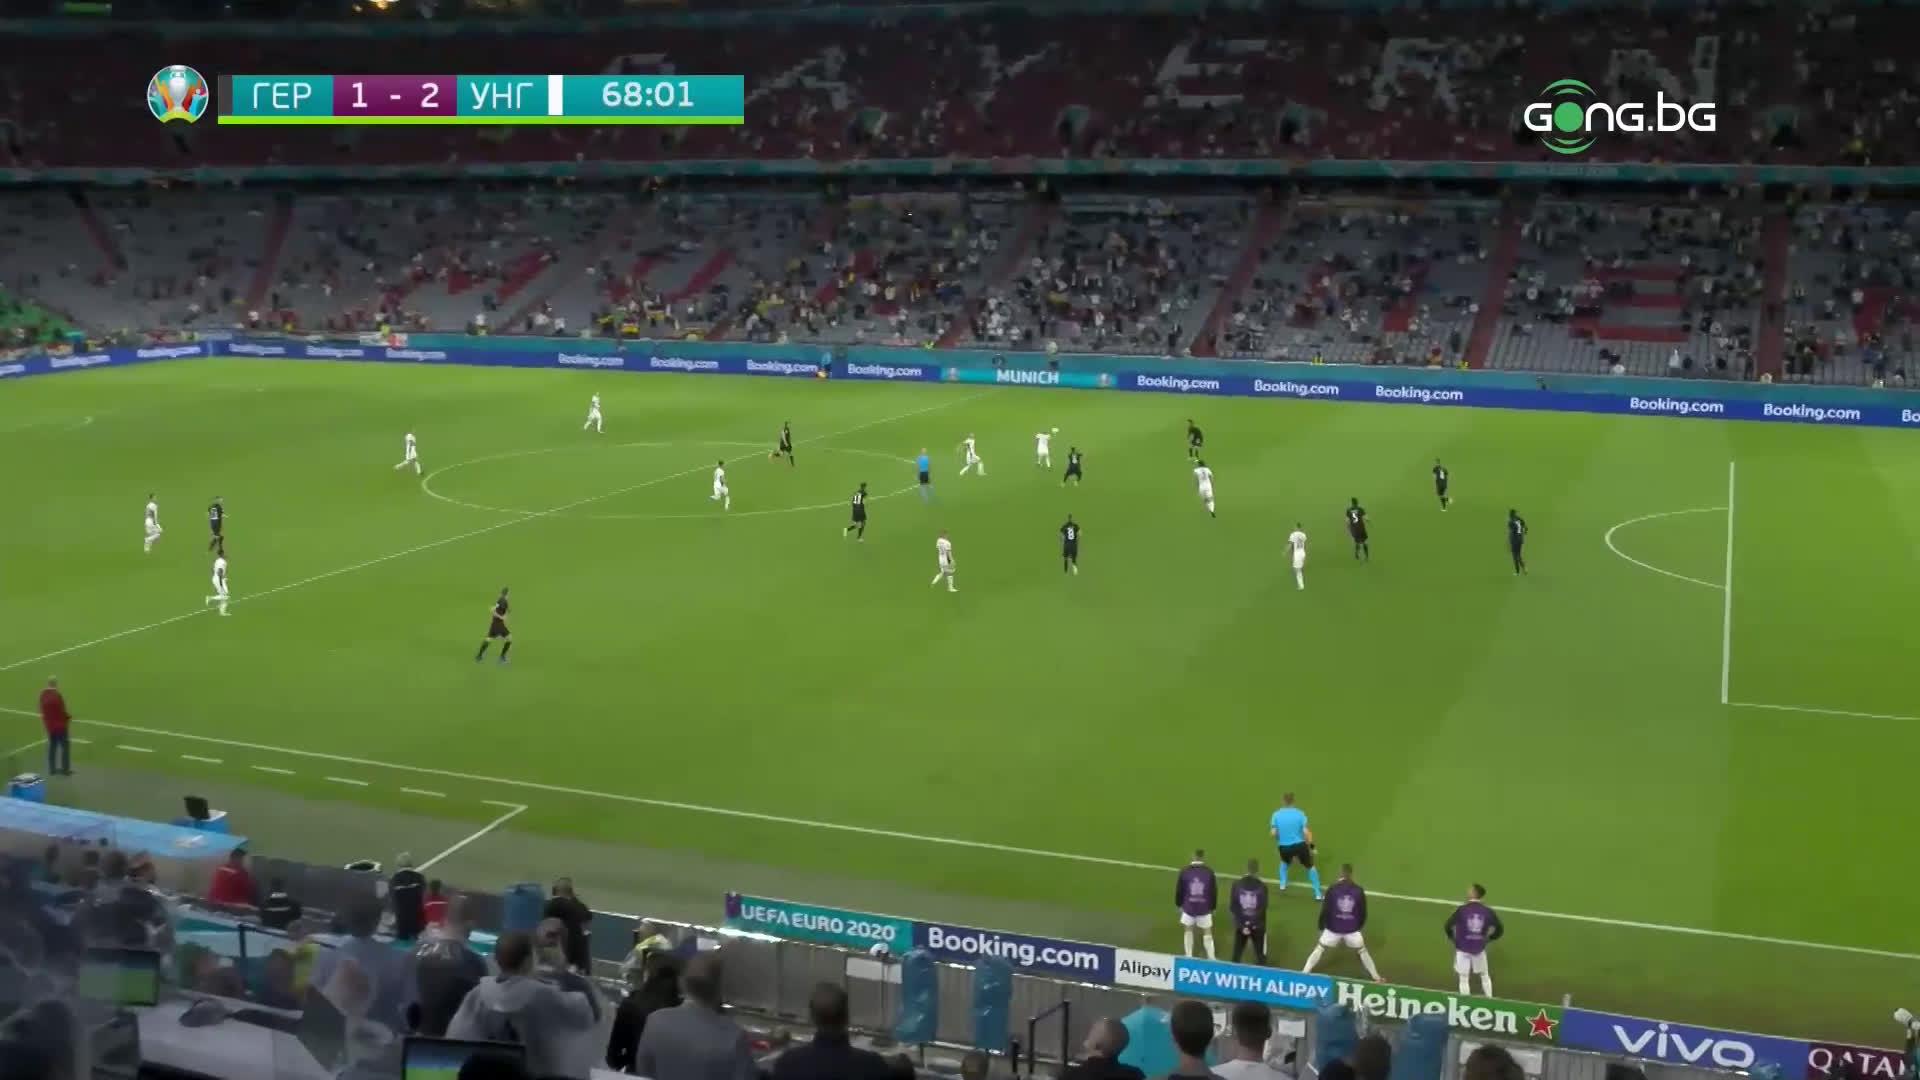 Германия - Унгария2:2 /репортаж/